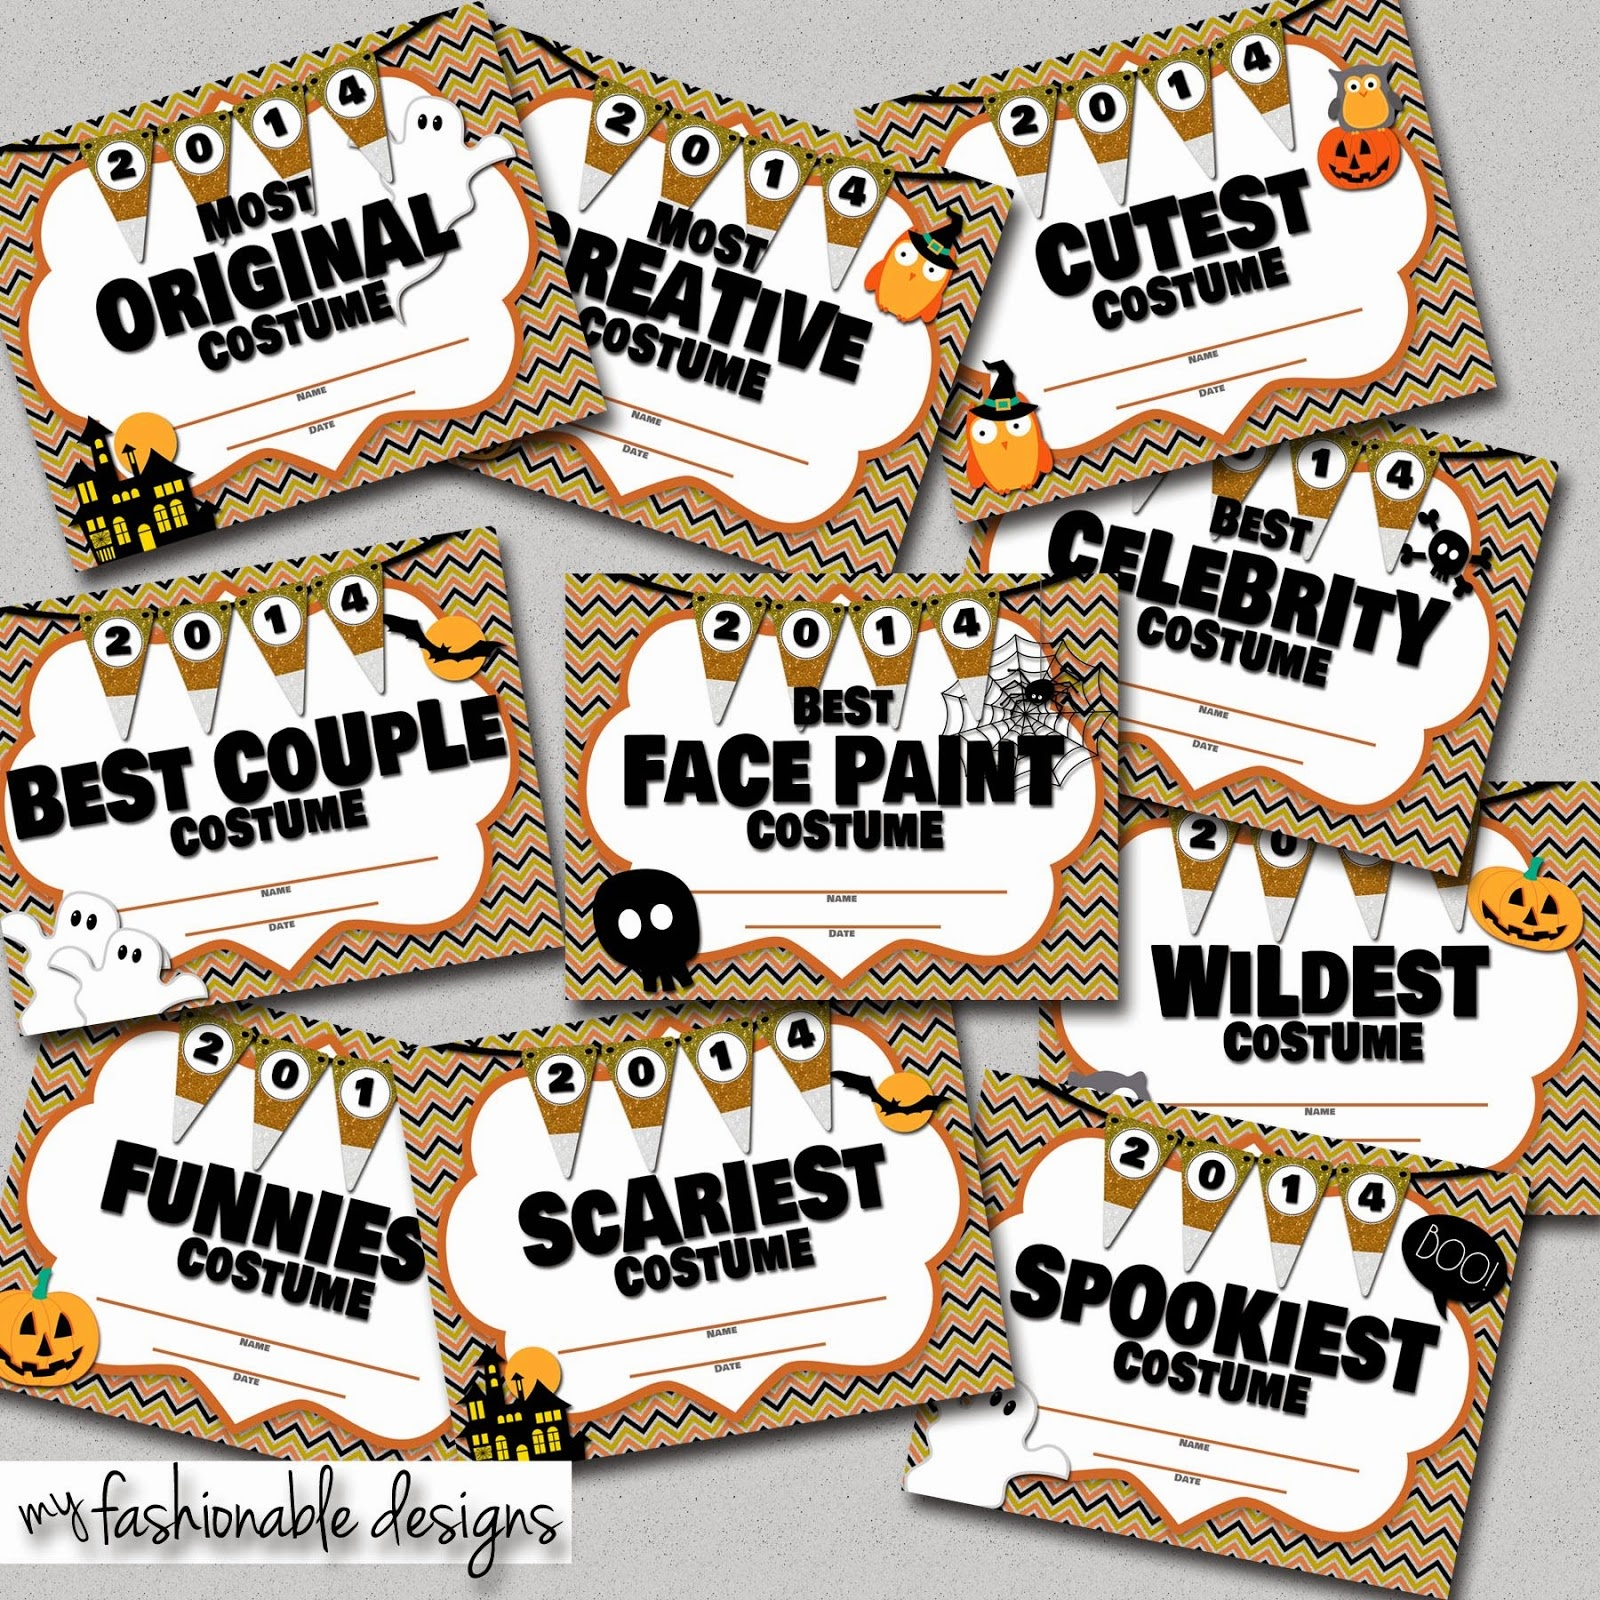 My Fashionable Designs: Halloween Costume Contest Certificates - Free Printable Halloween Award Certificates